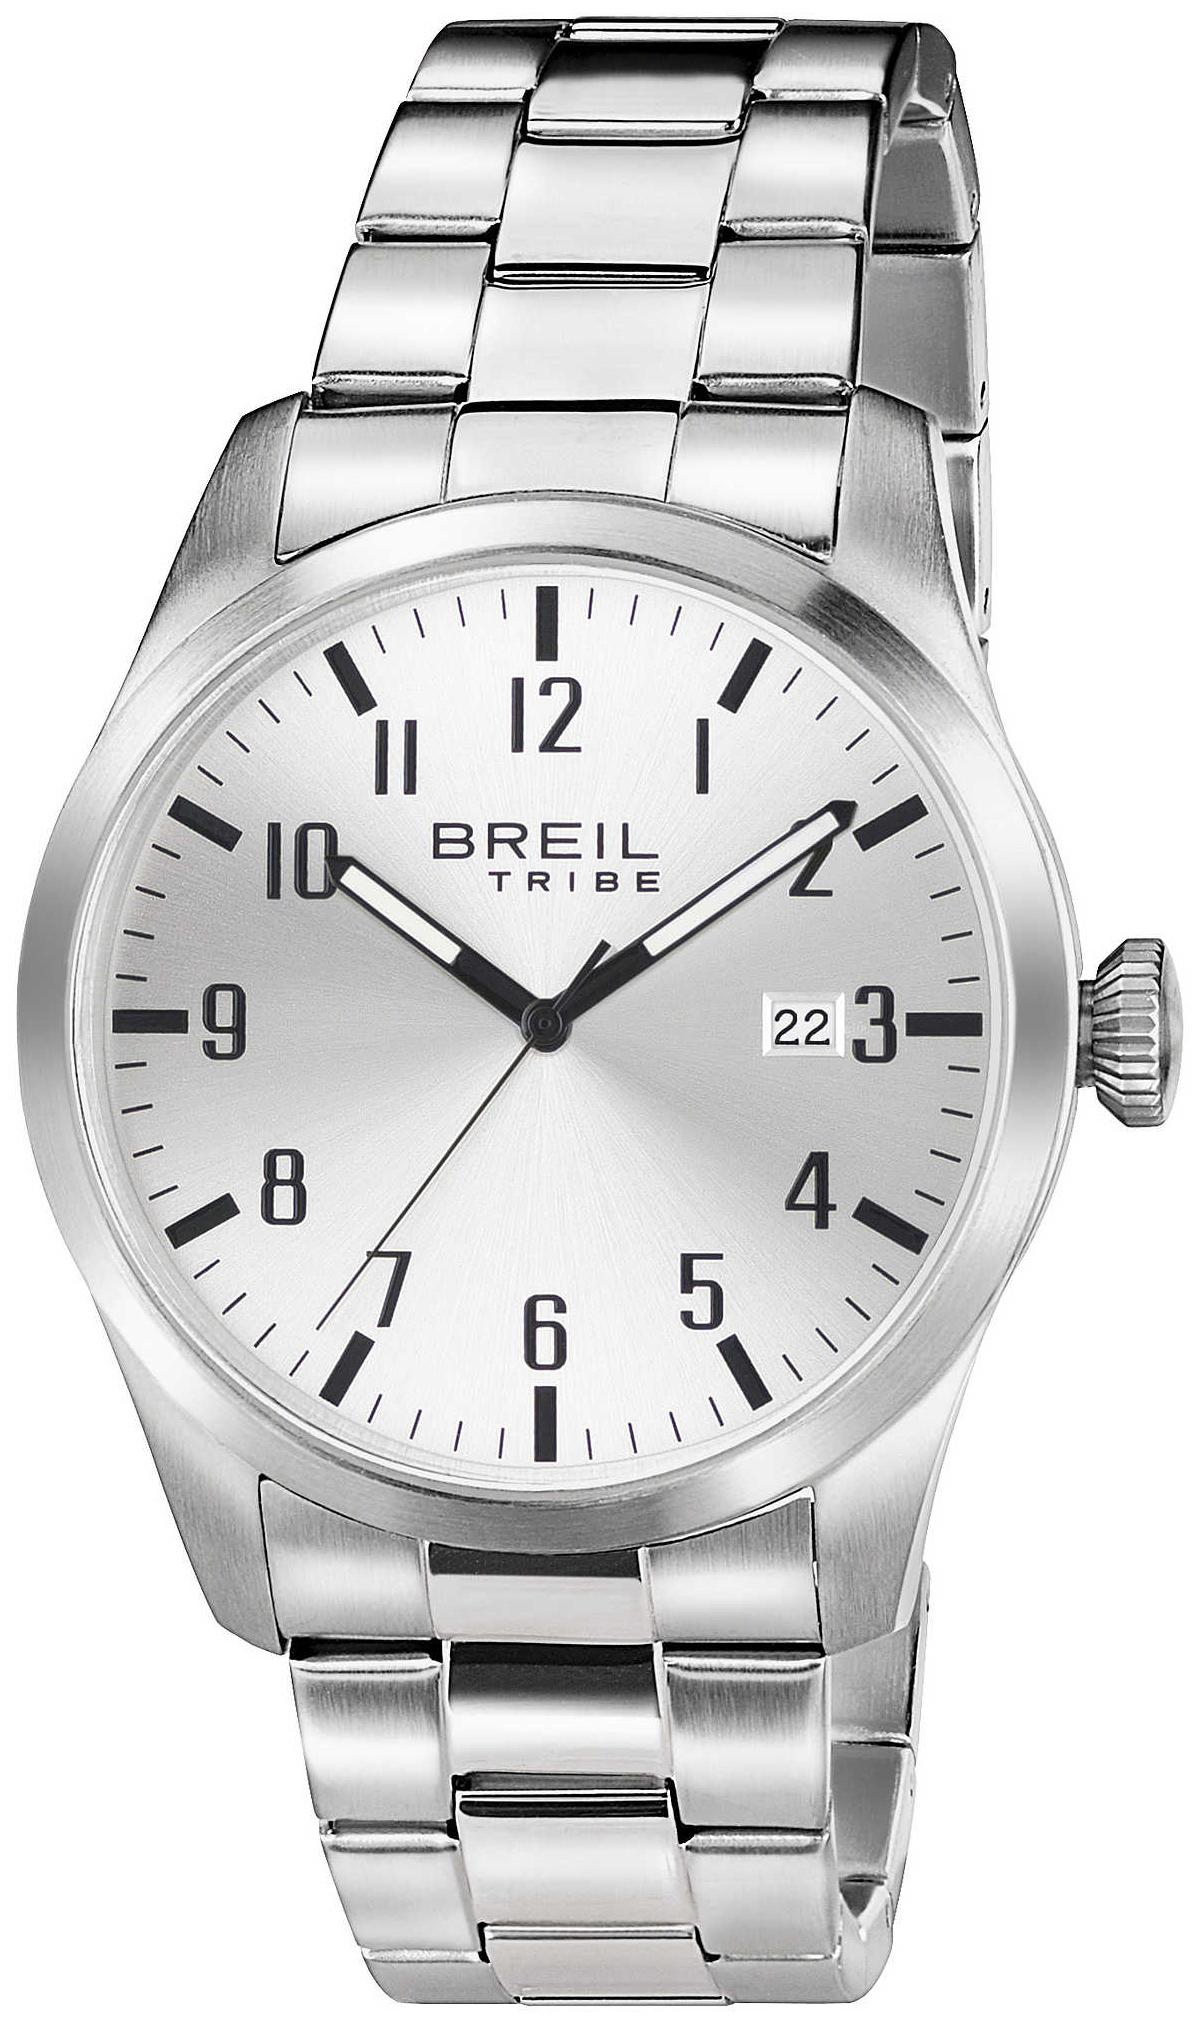 Breil Tribe Herreklokke EW0231 Sølvfarget/Stål Ø42 mm - Breil